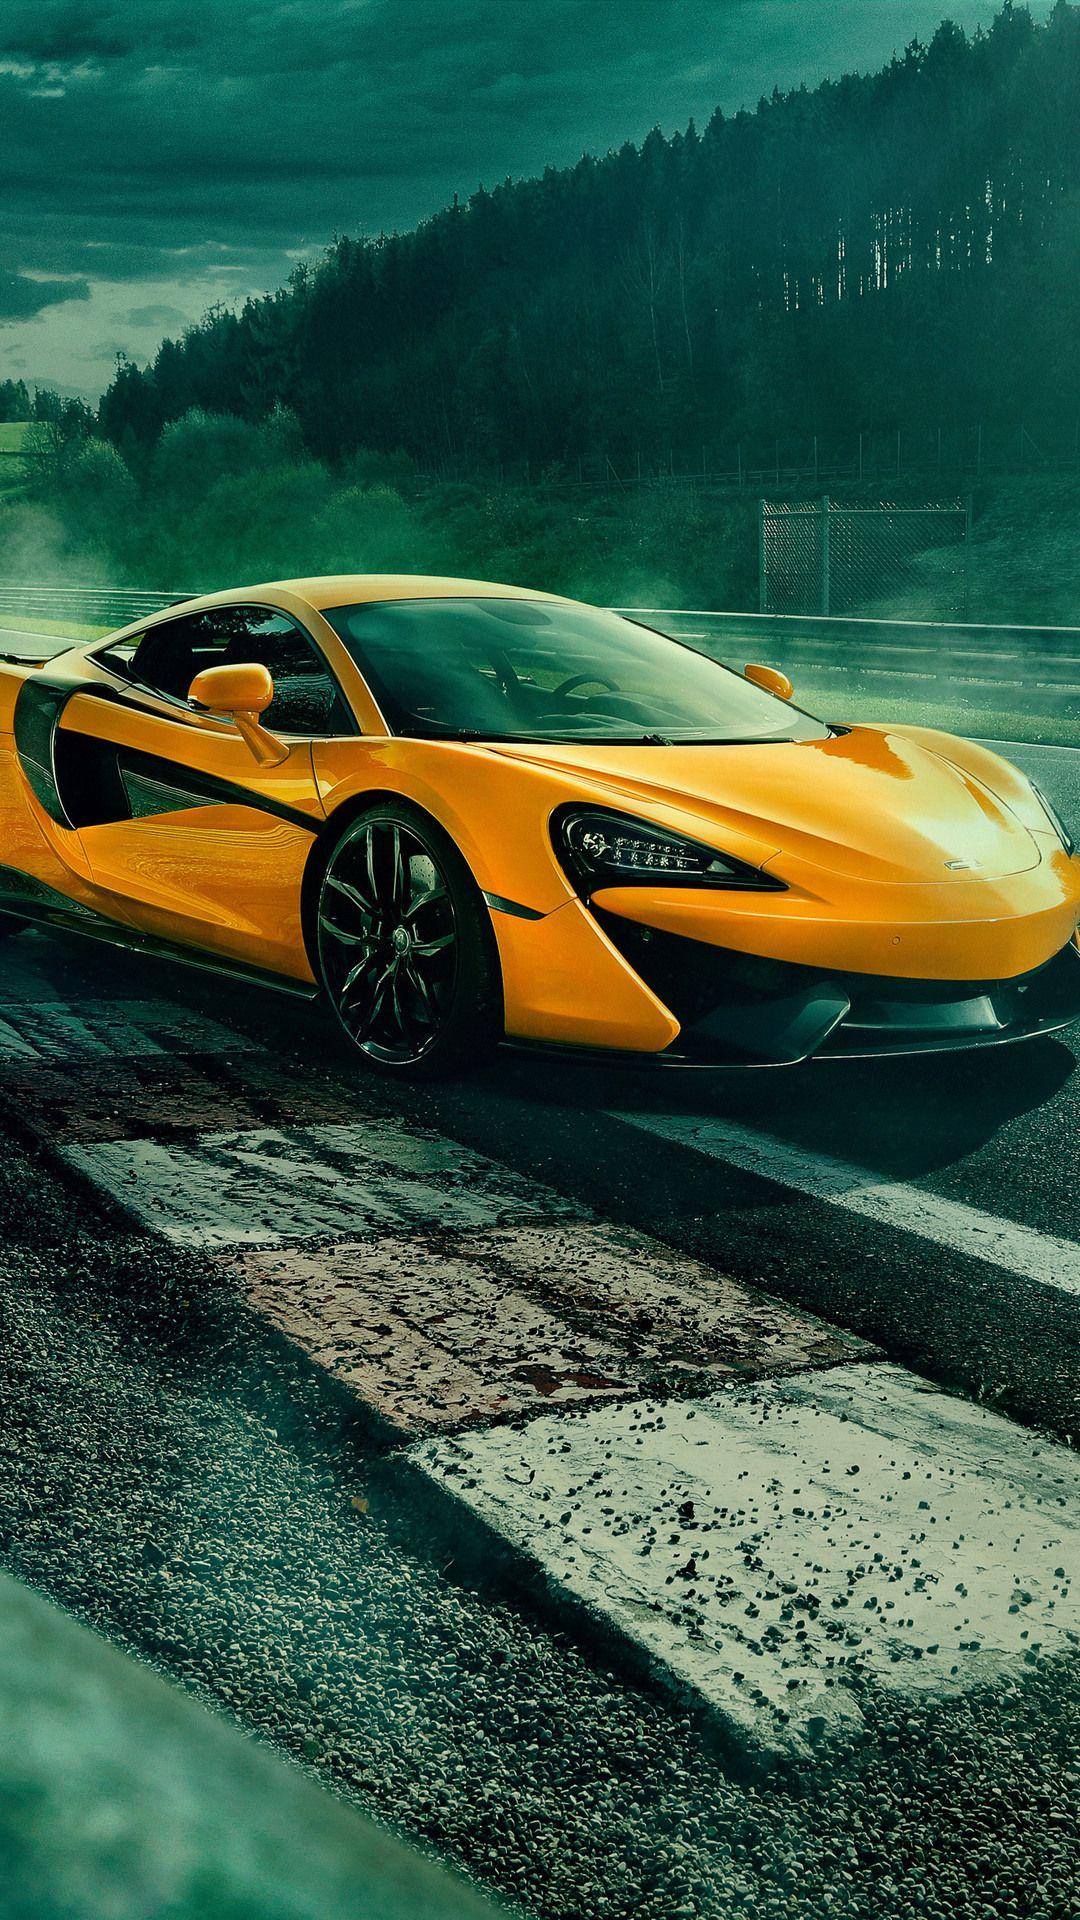 Mclaren 570s 2018 Maclaren Cars Super Cars Sports Car Wallpaper